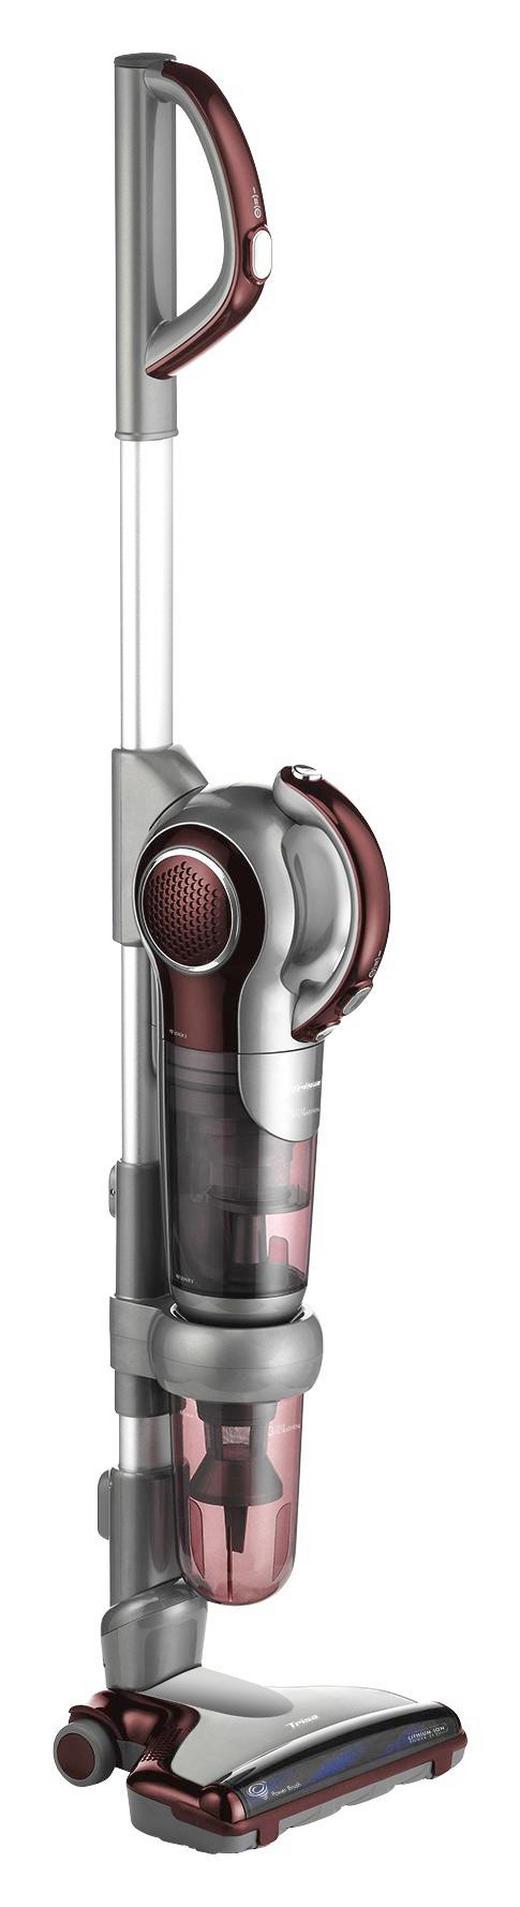 AKKU-BODENSTAUBSAUGER  Quick Clean Professional T7883 - Rot/Grau, KONVENTIONELL, Kunststoff (110/27/21cm)